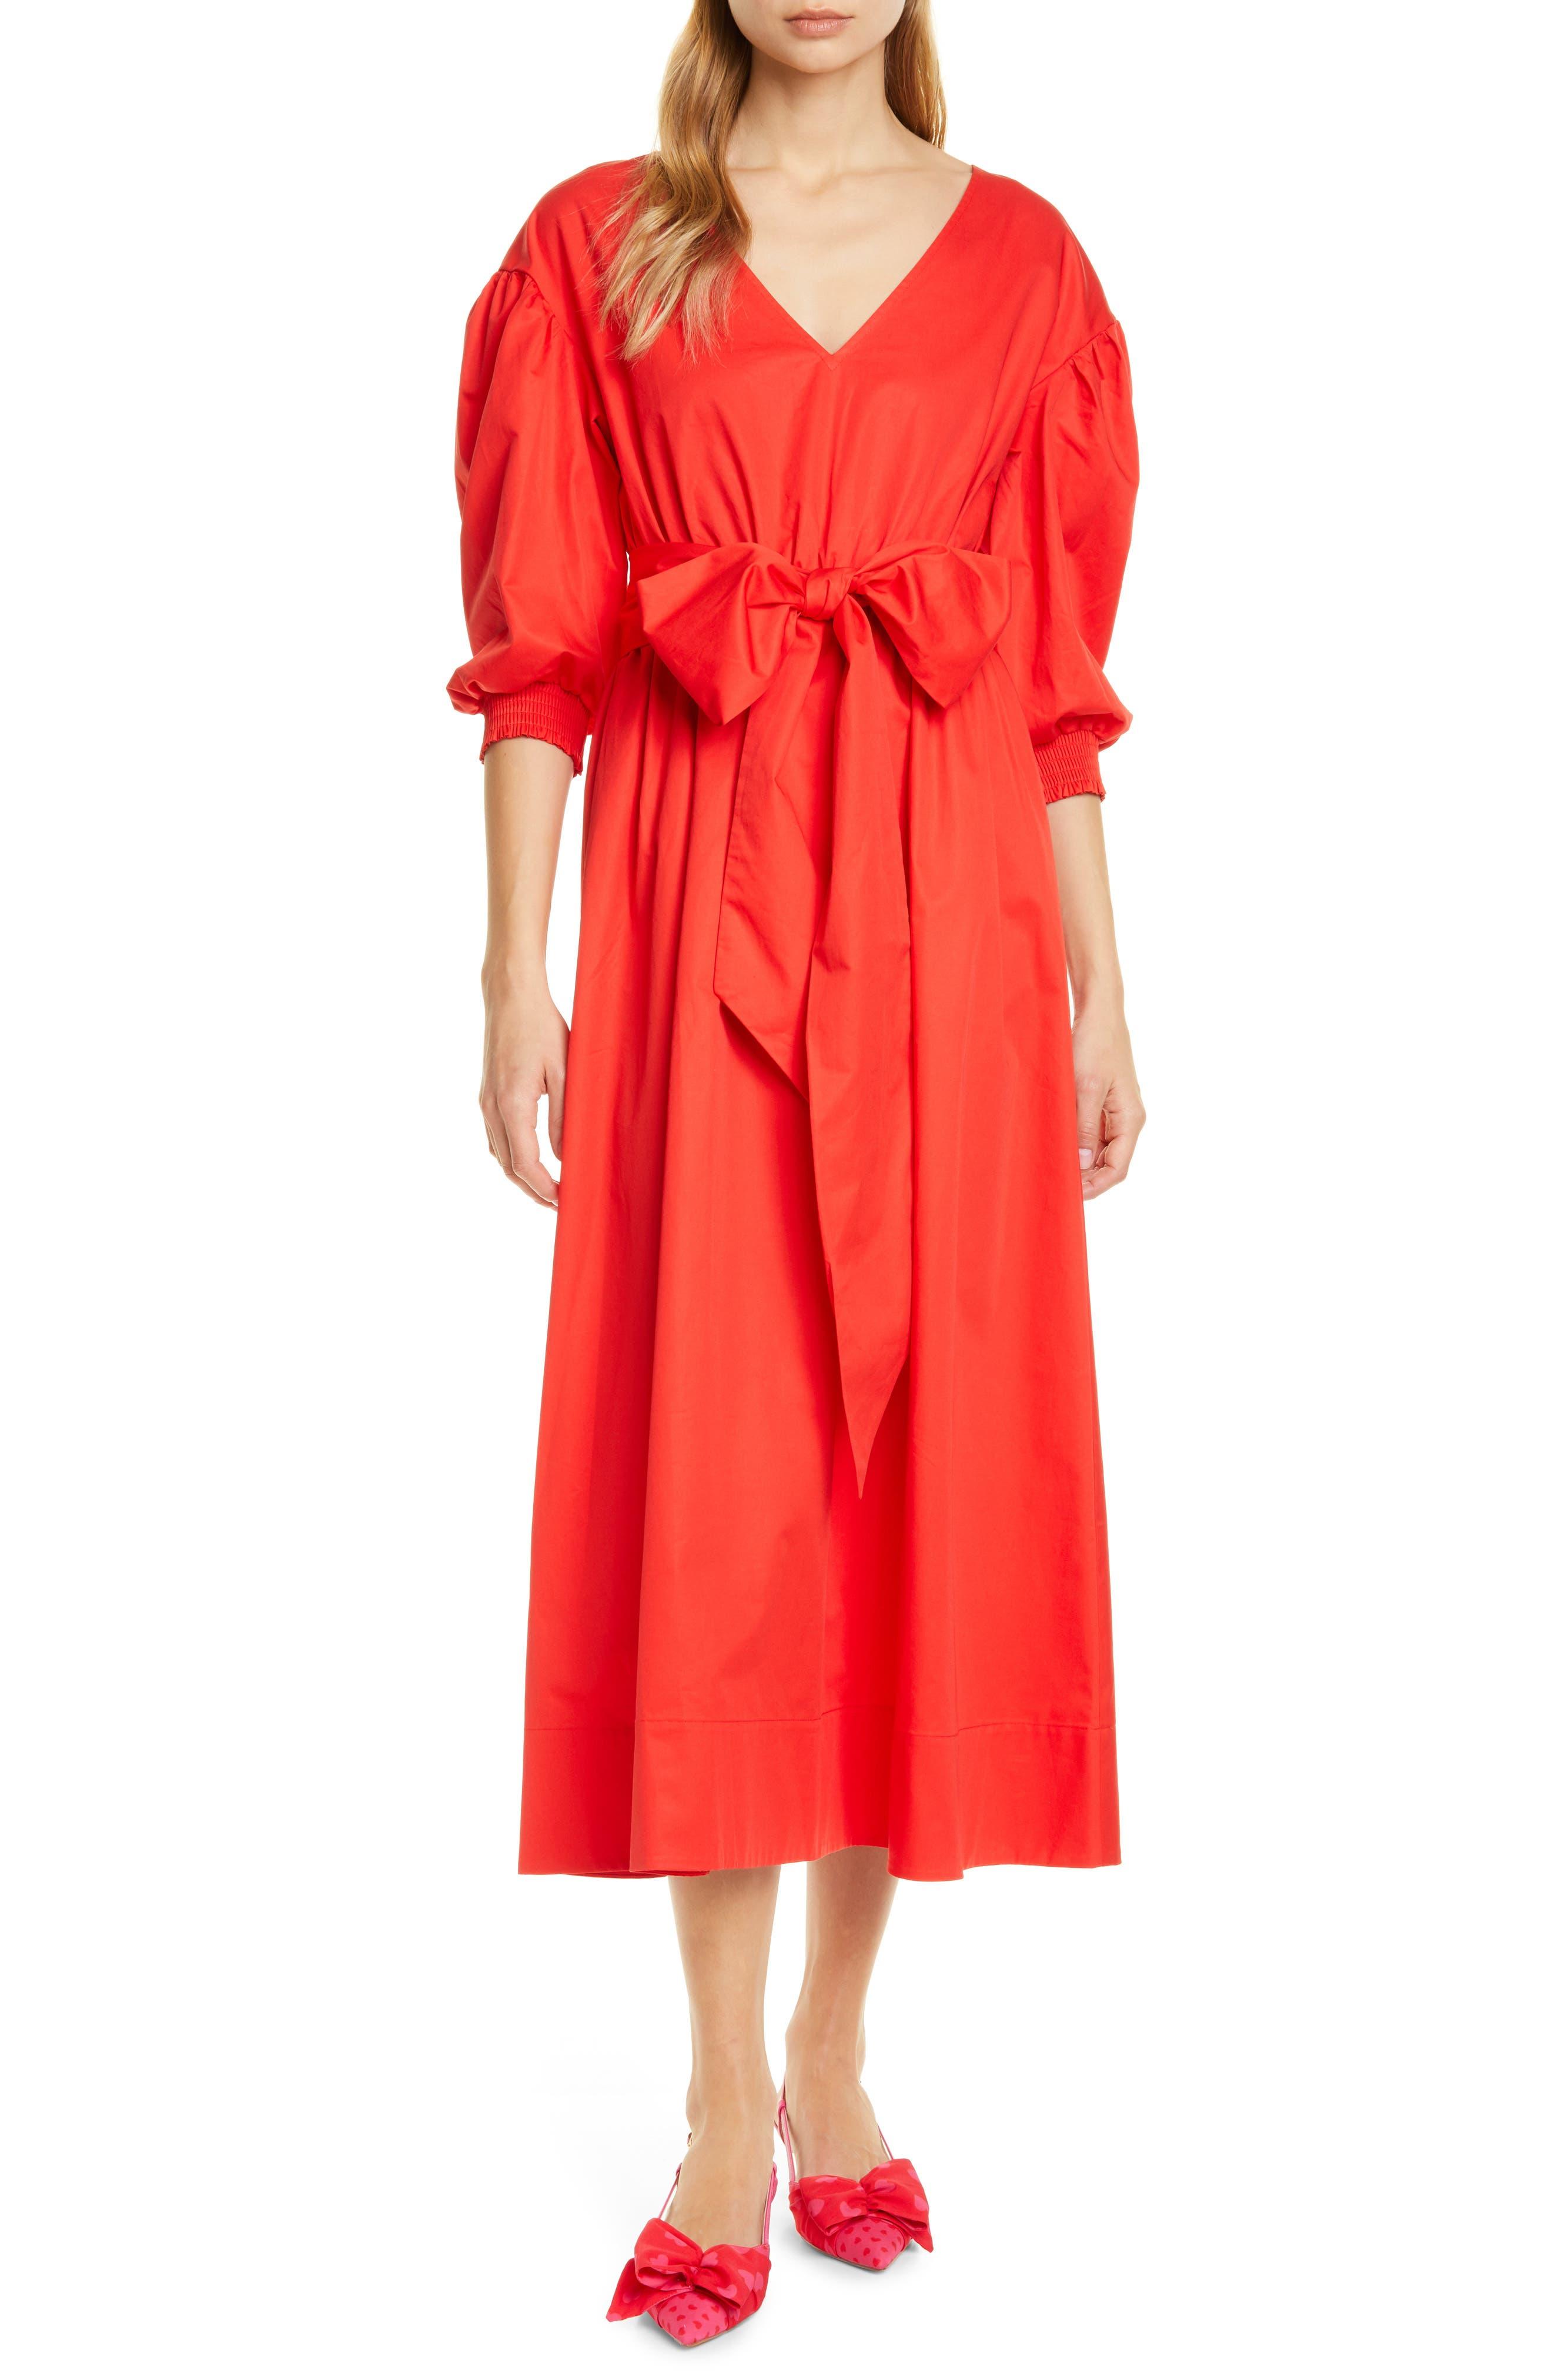 Kate Spade New York Puff Sleeve Midi Dress, Red